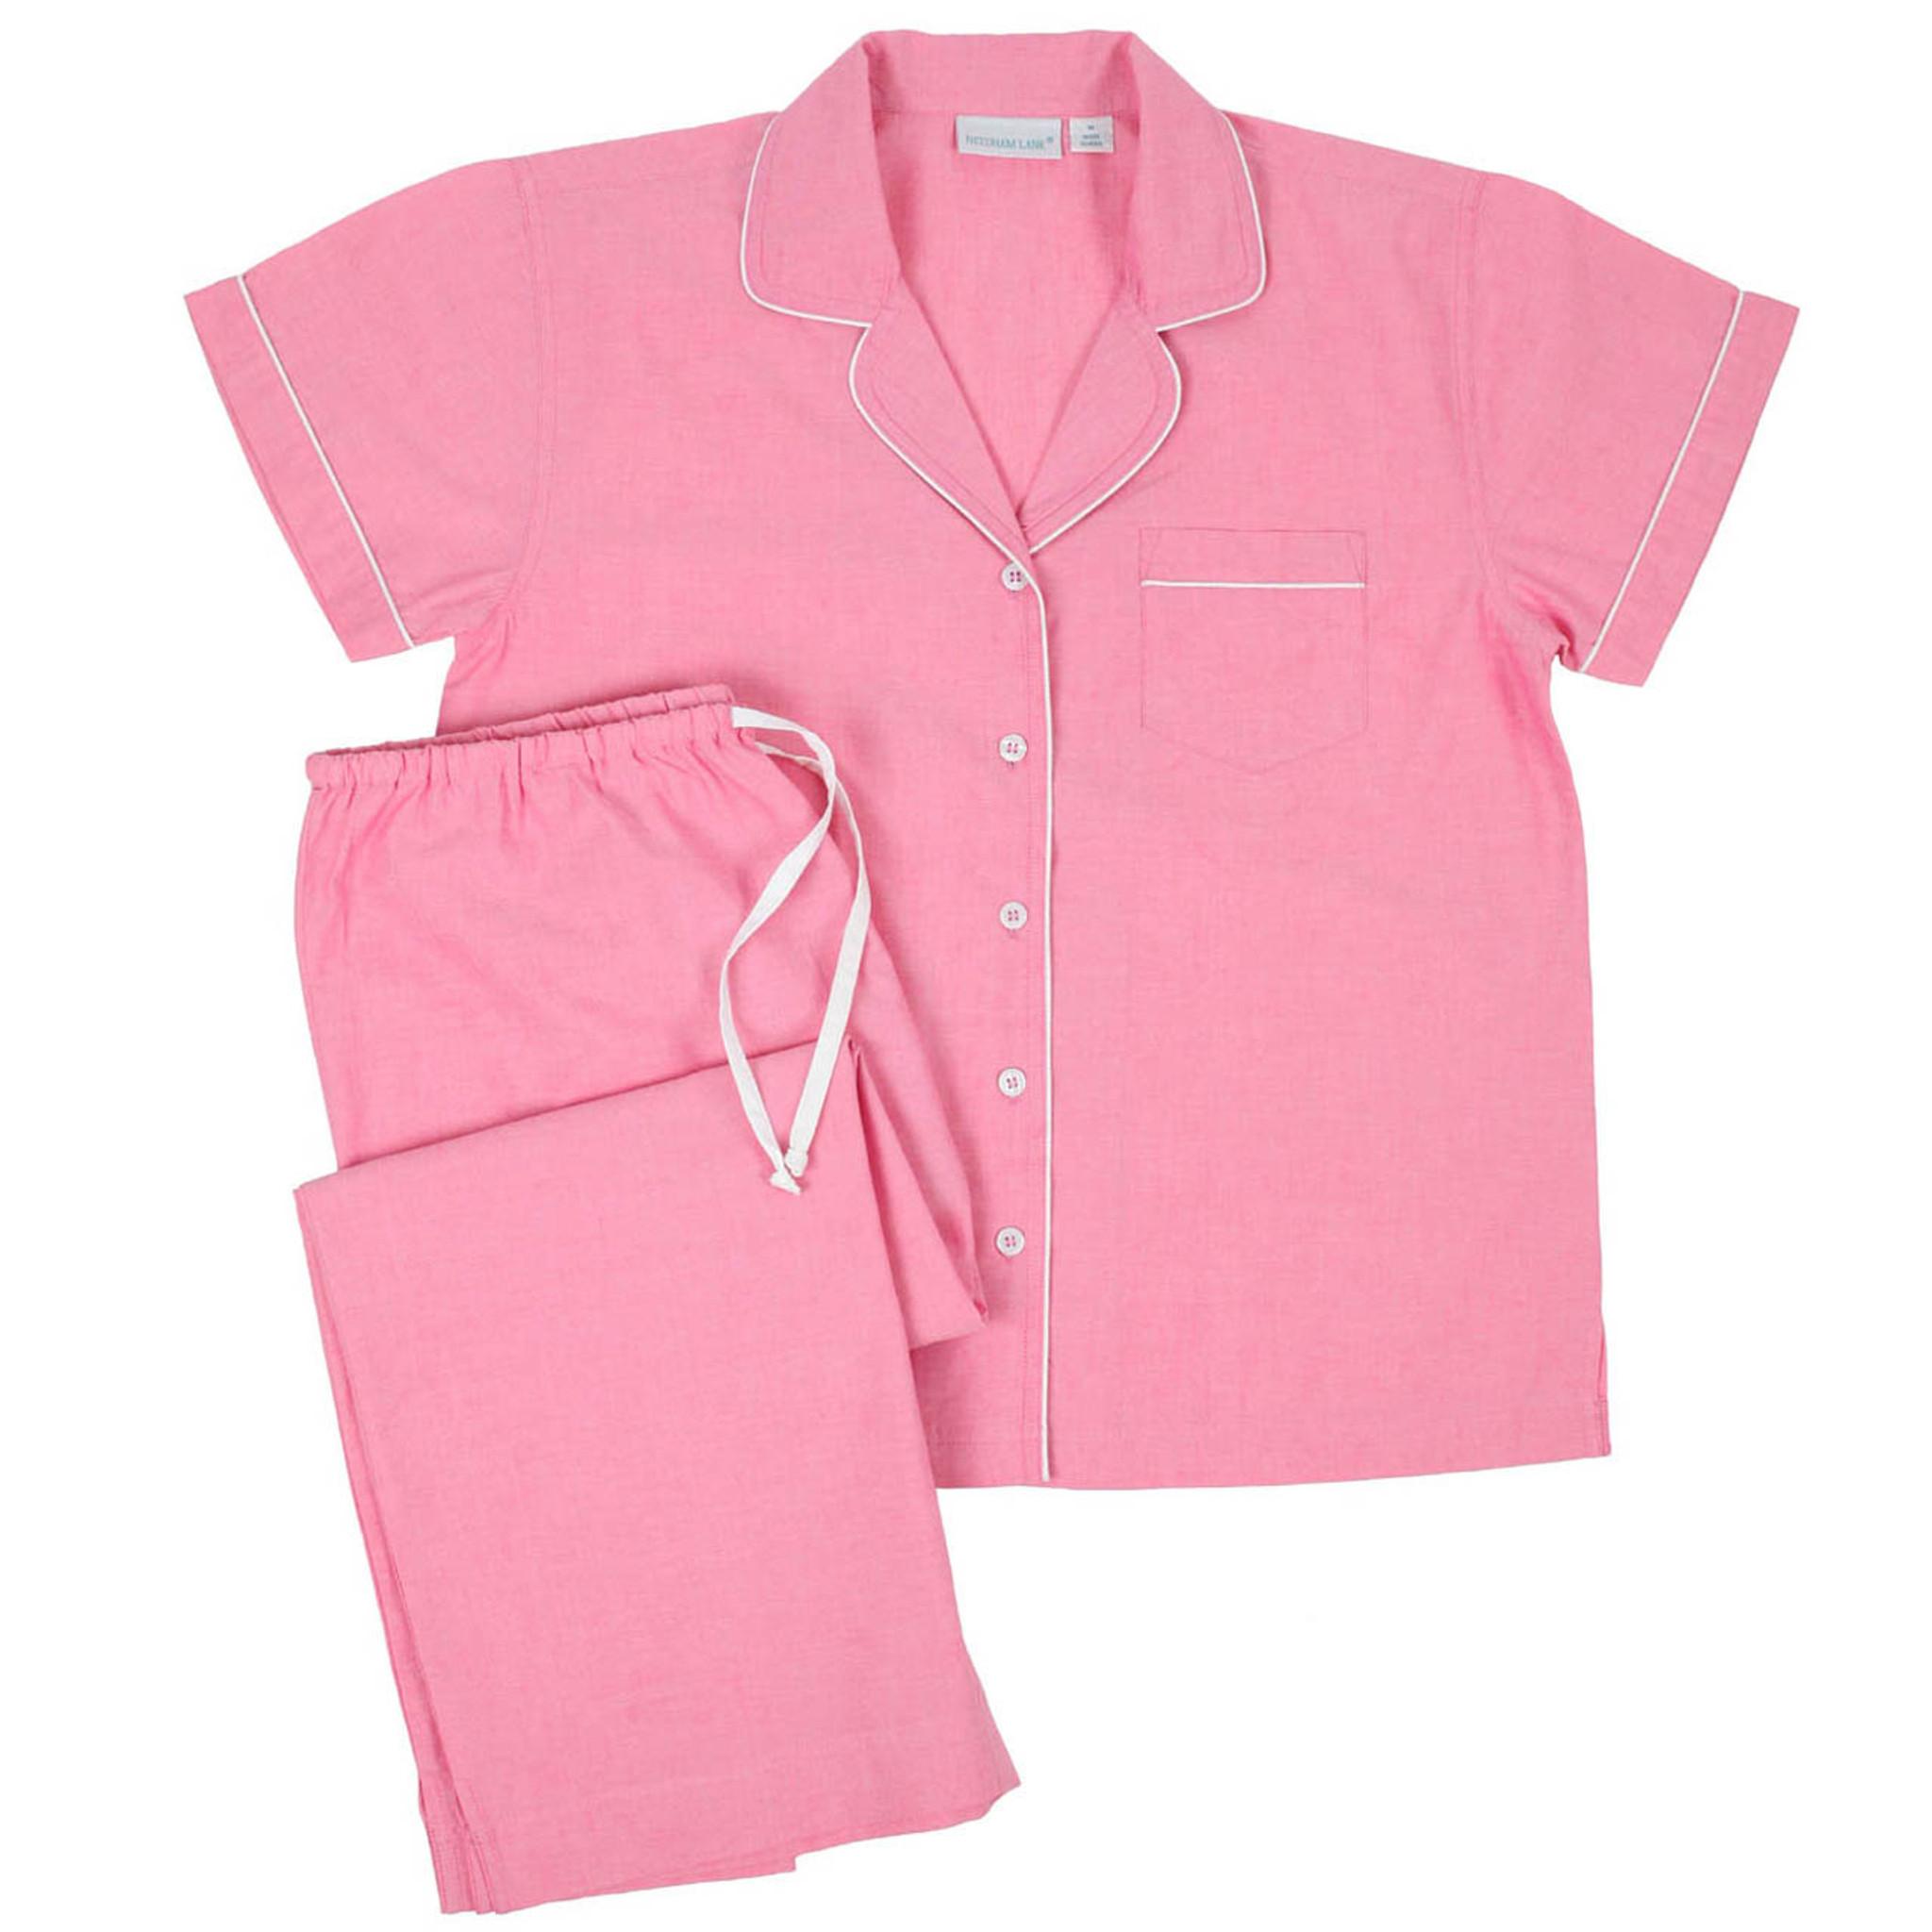 cc137b7840 Primrose Short Sleeve Capri Pajamas - Needham Lane Ltd.